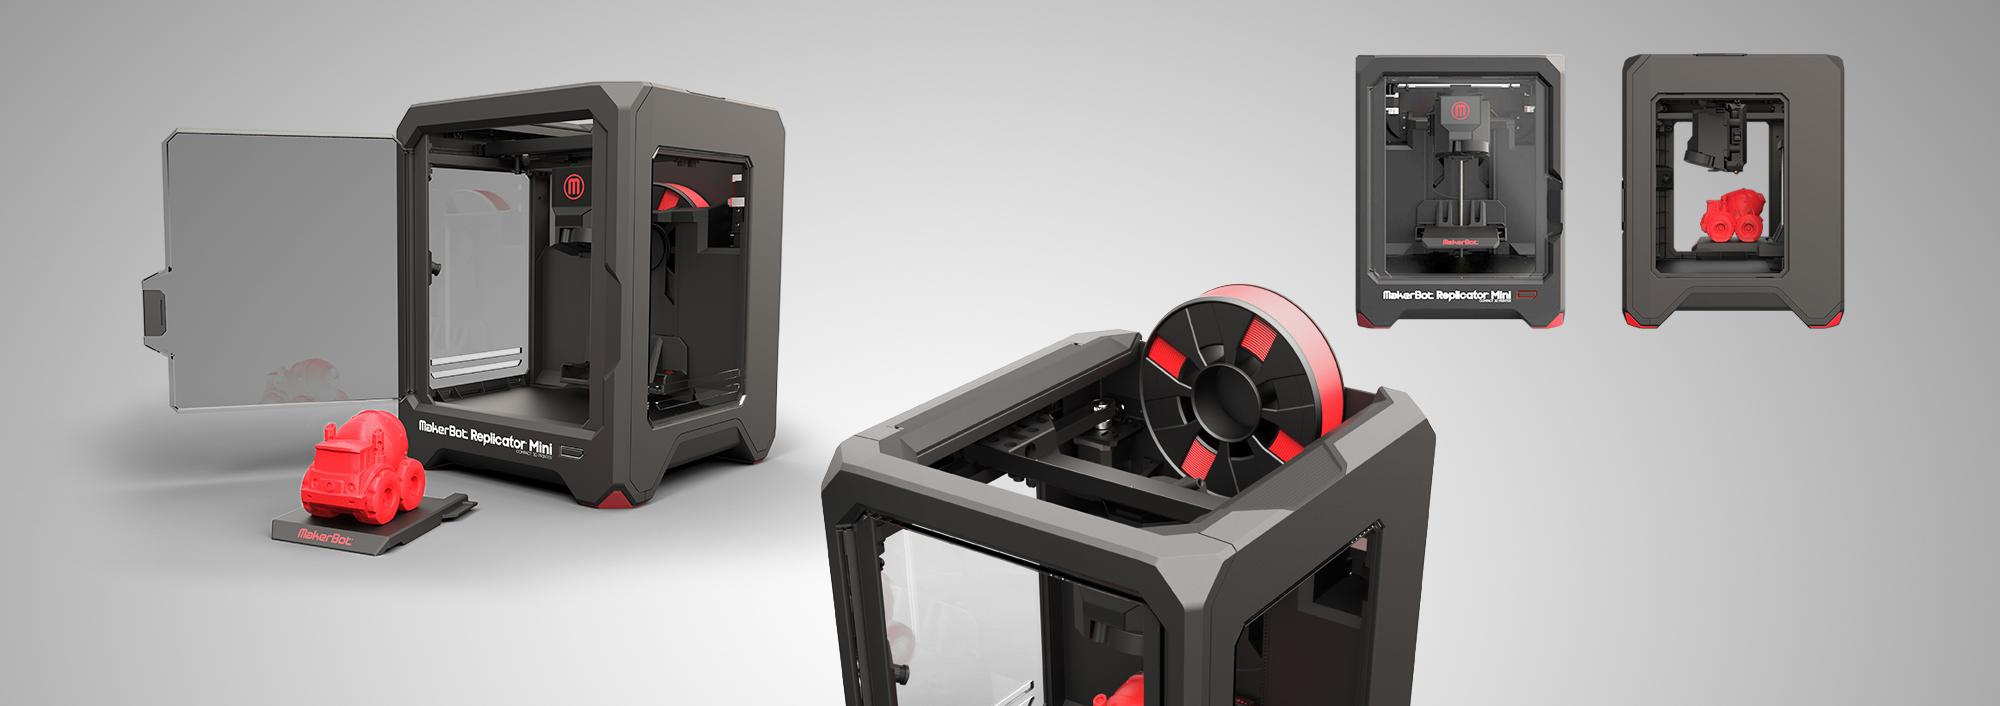 makerbot-mini4_2000